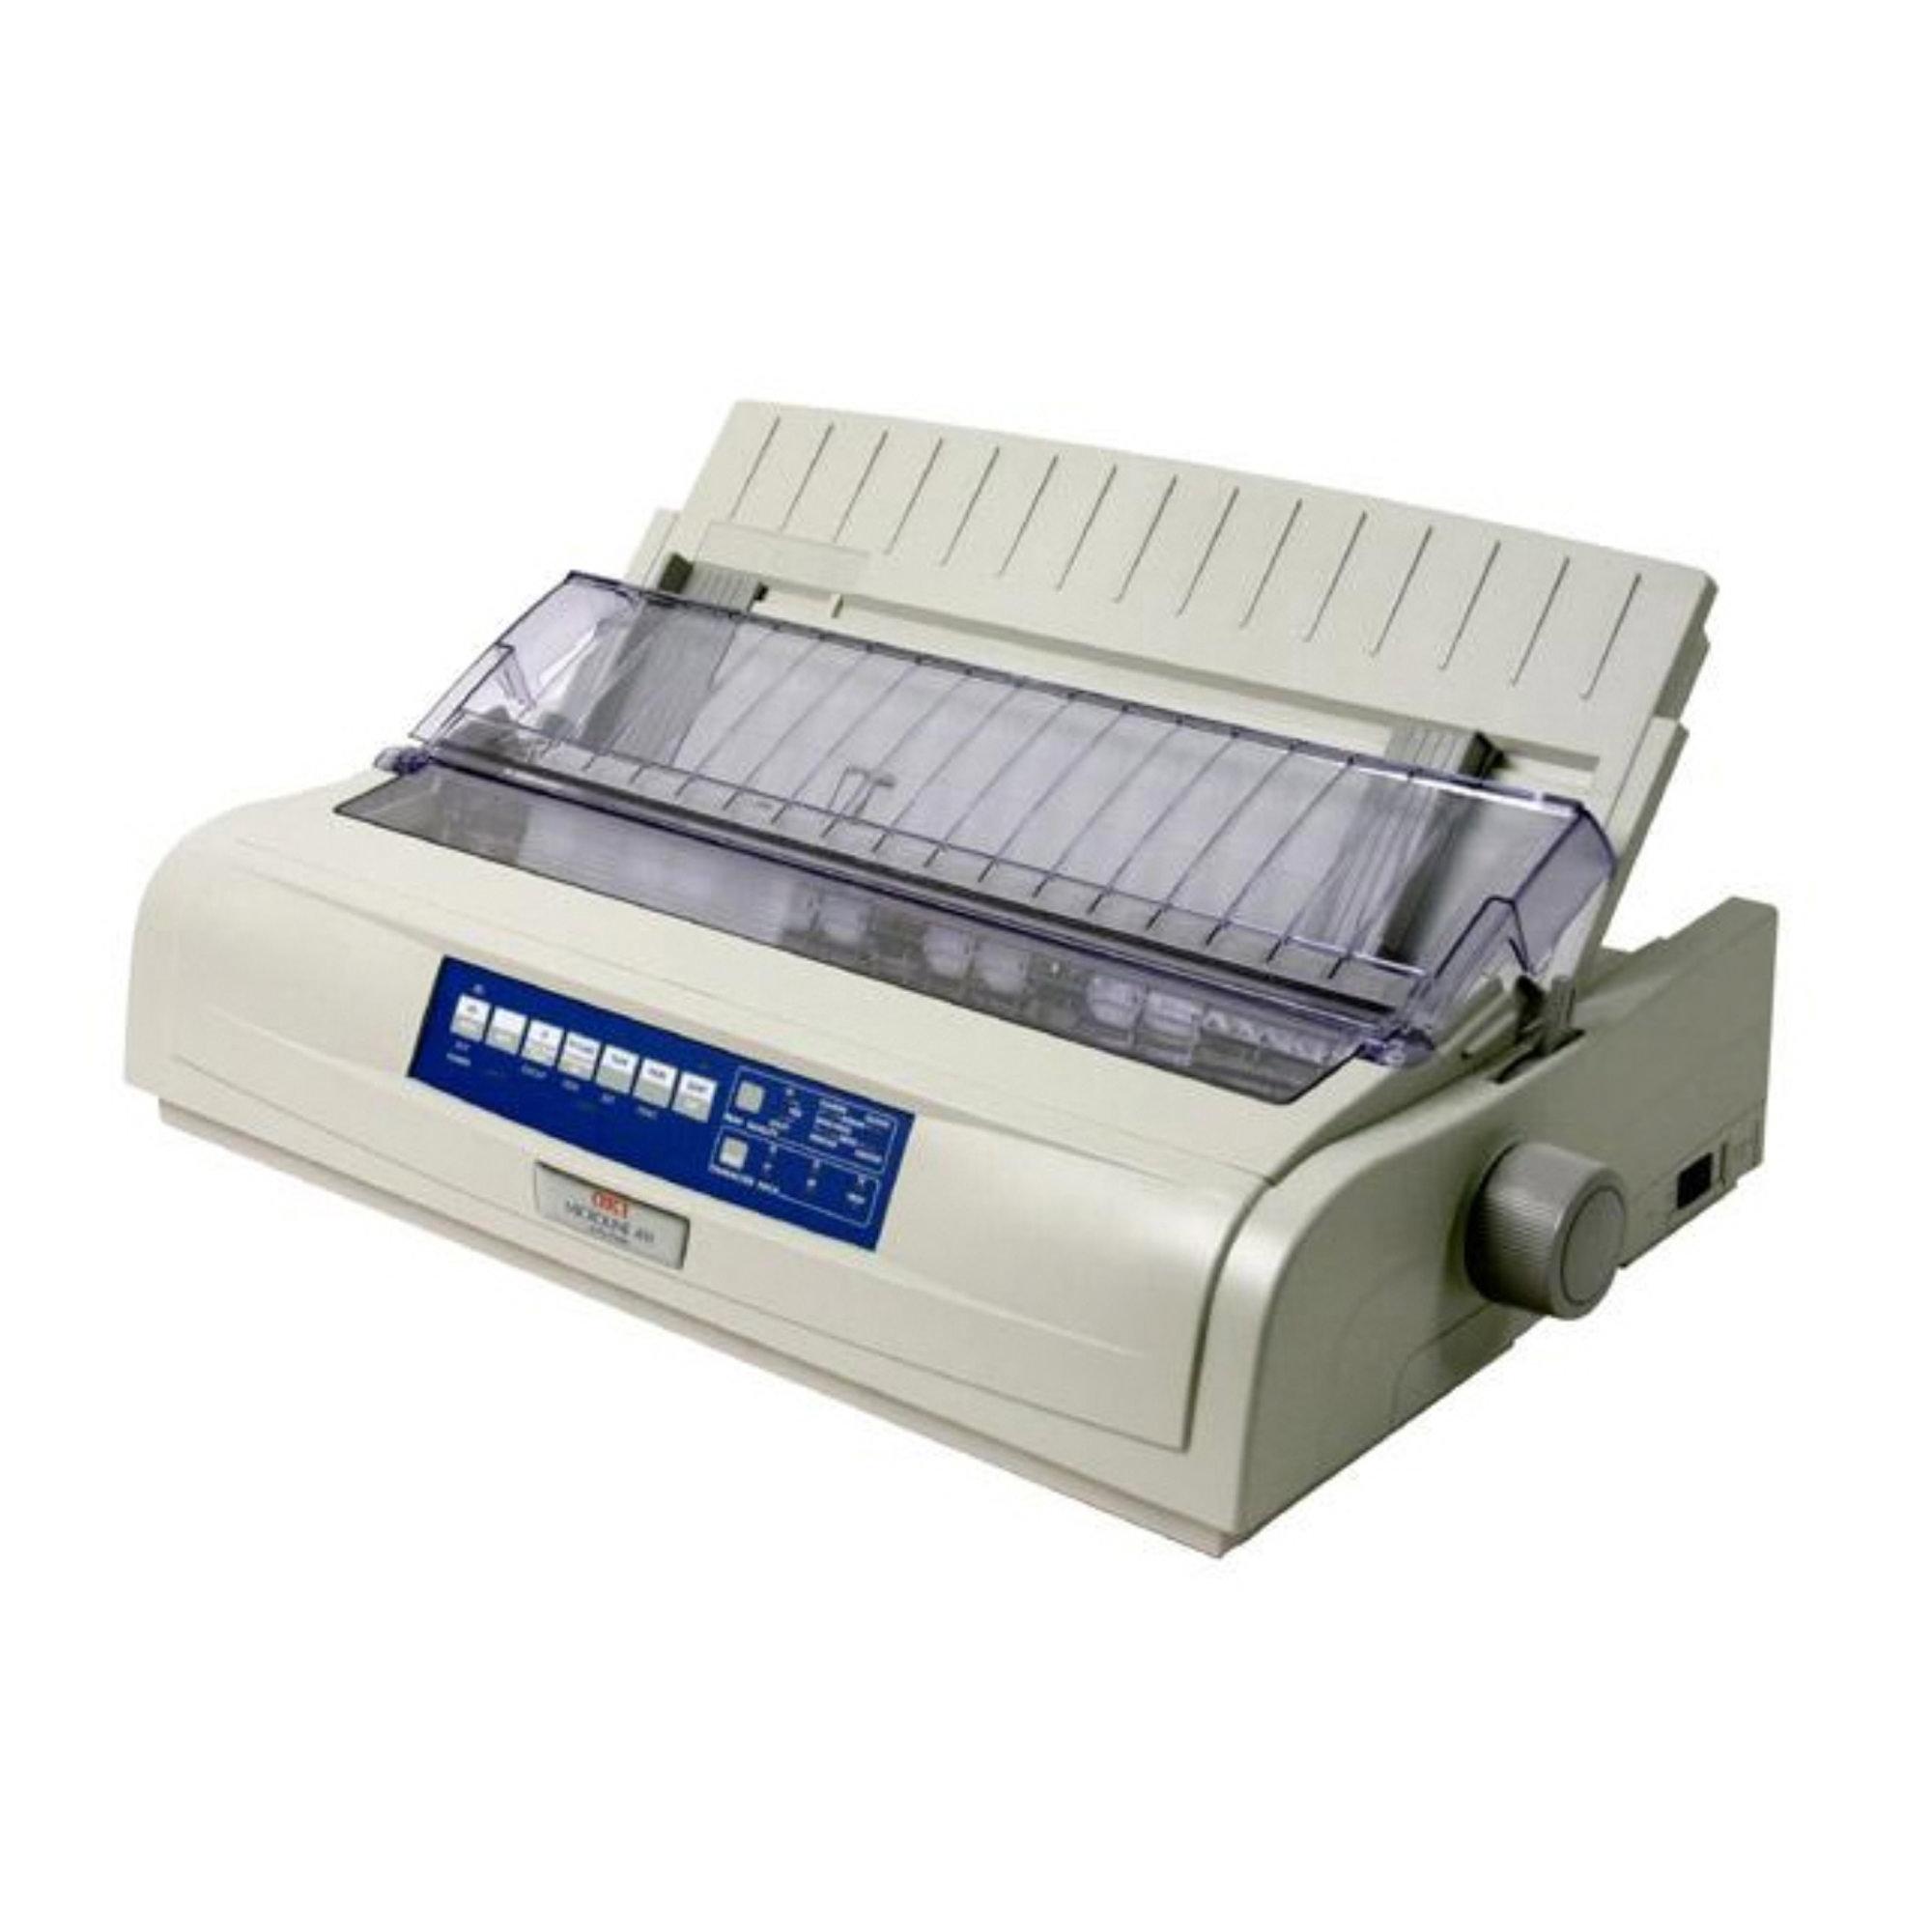 Okidata Microline 491n Dot Matrix Printer - Beige